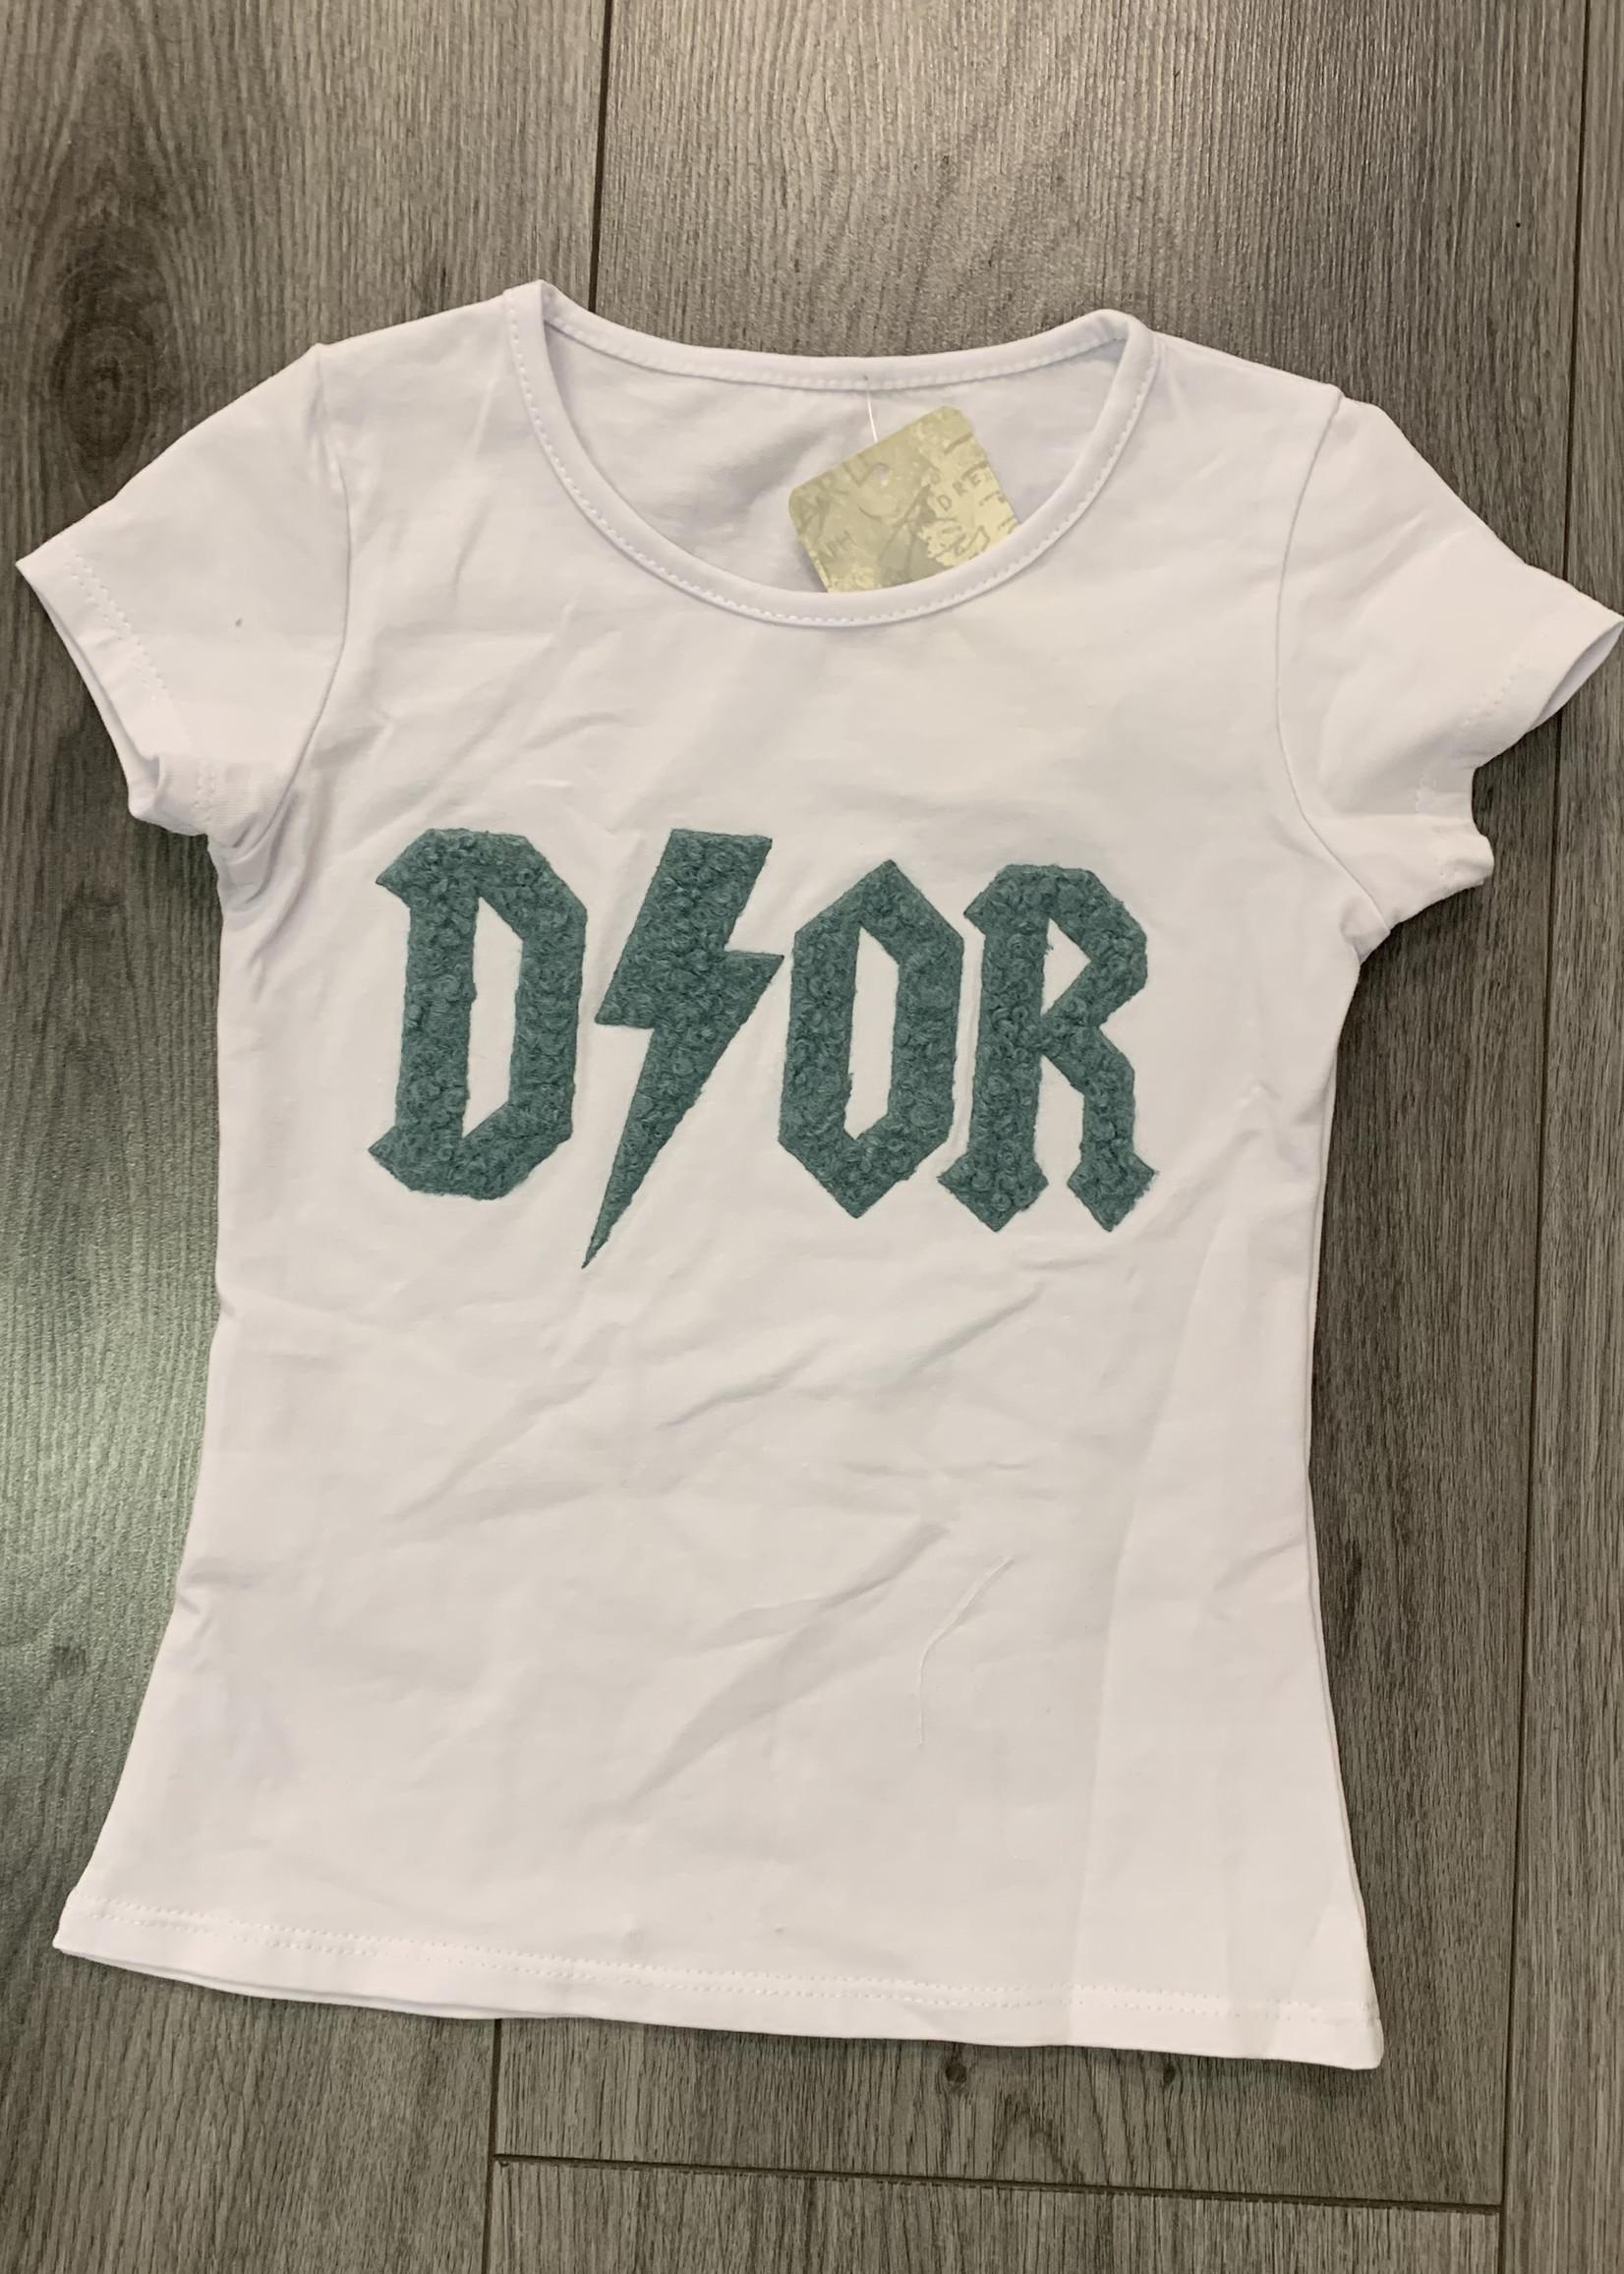 Divanis Divanis dior tshirt groene letters